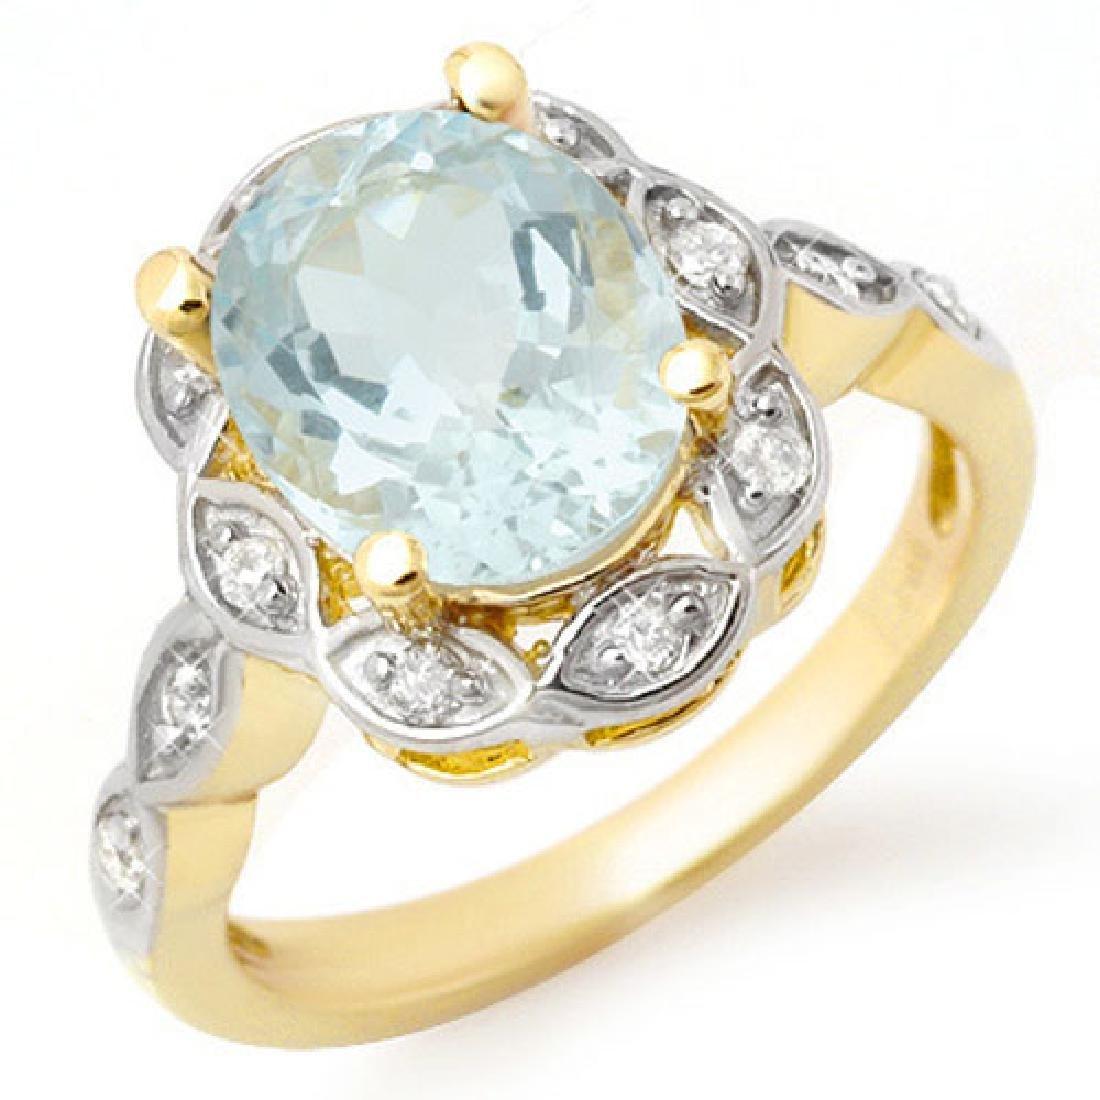 2.65 CTW Aquamarine & Diamond Ring 14K Yellow Gold